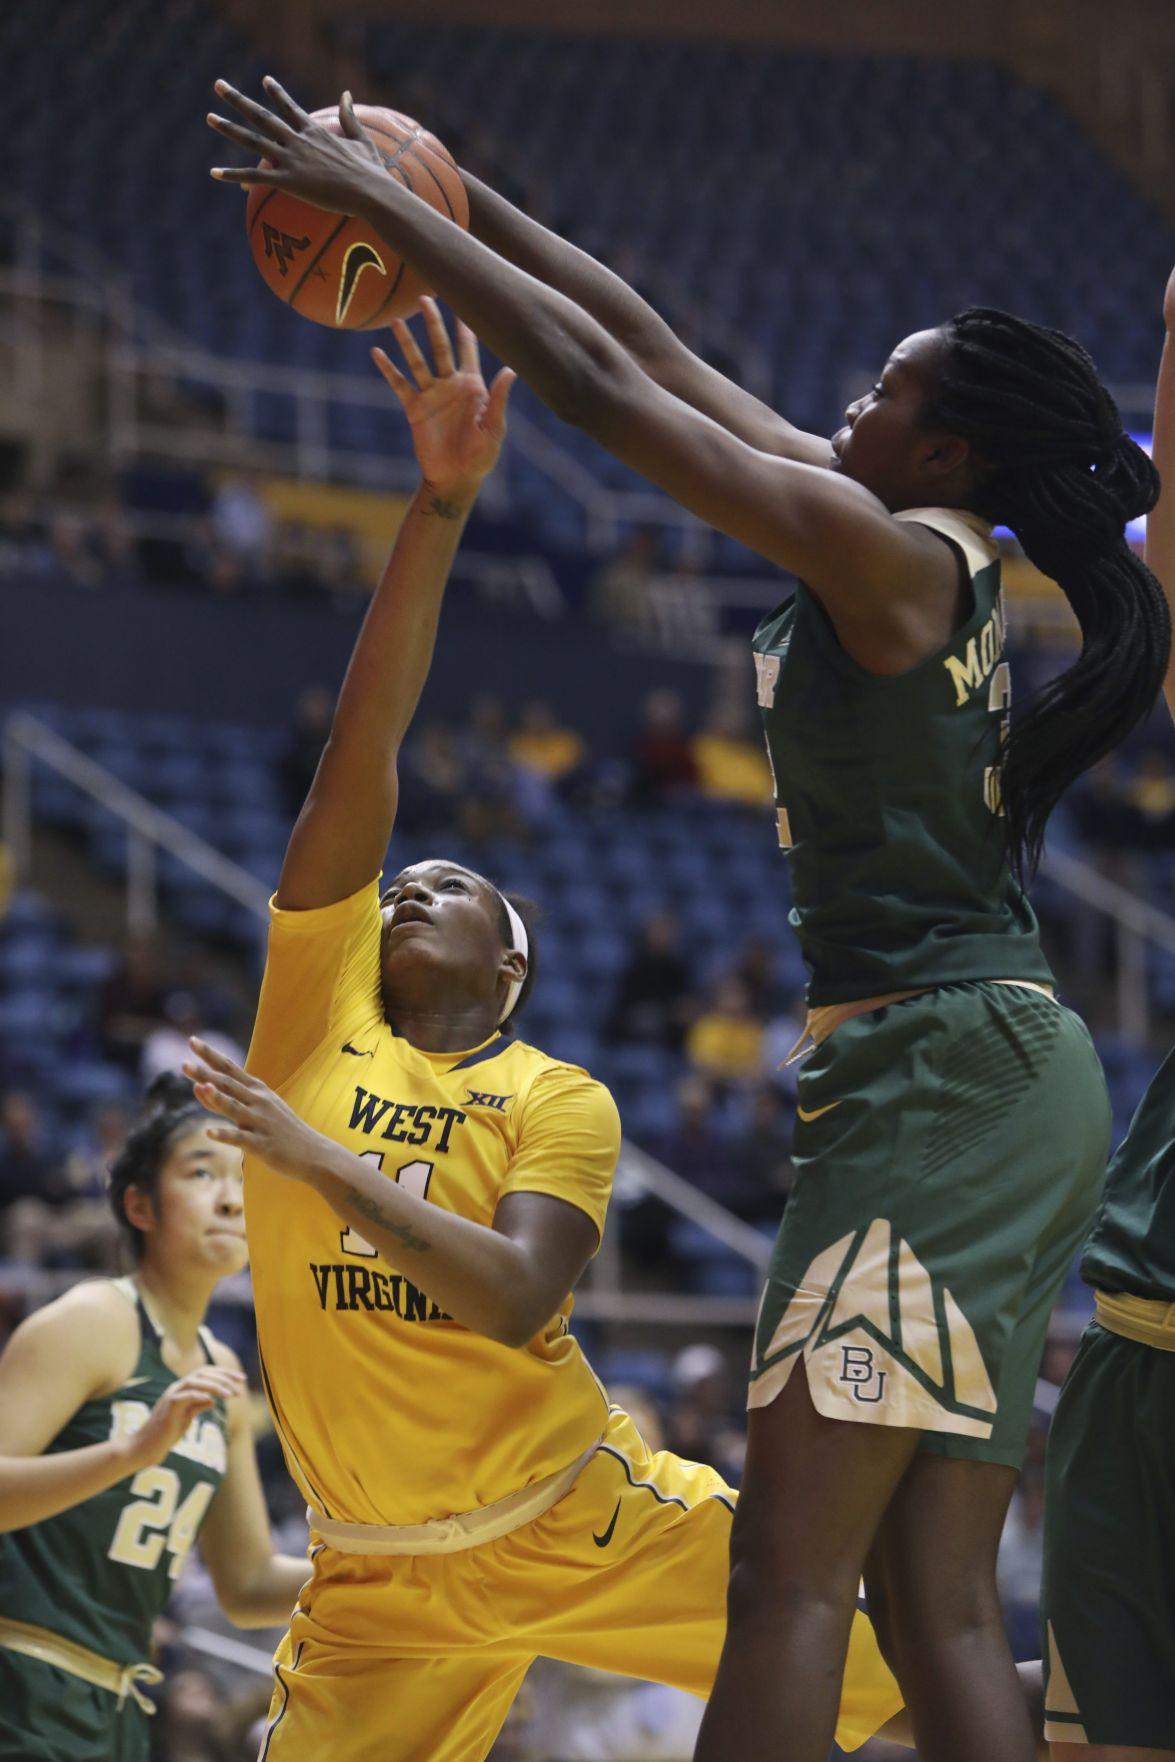 Baylor_West_Virginia_Basketbal